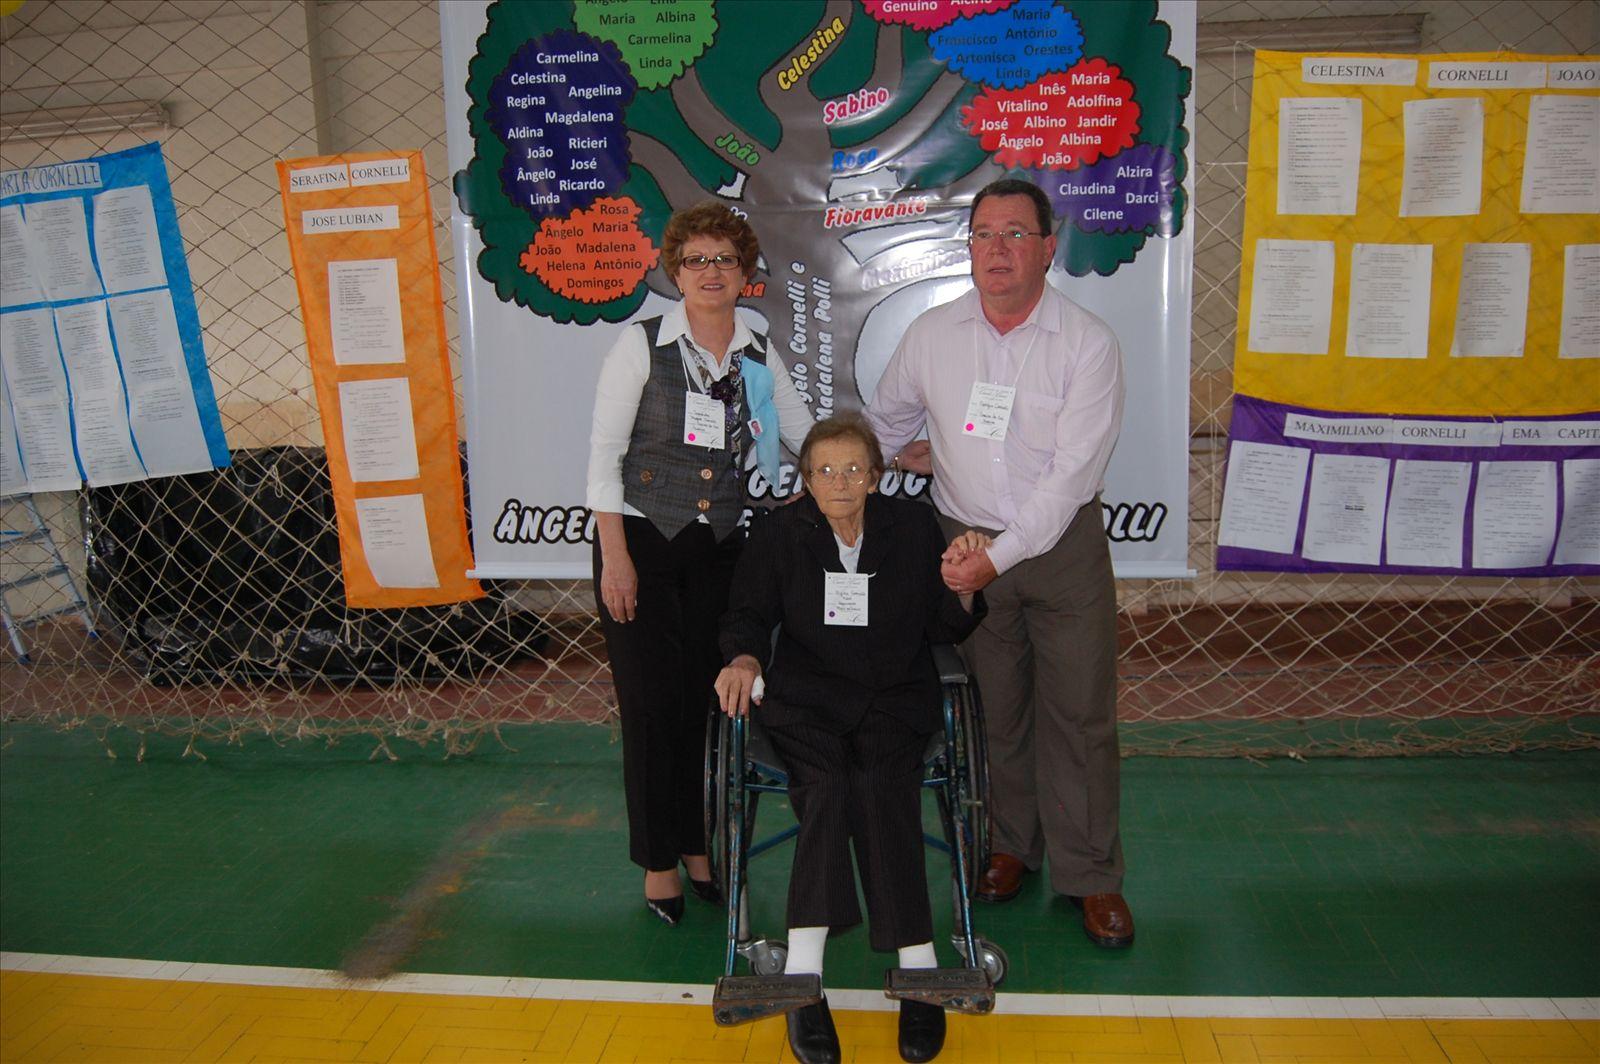 2º Encontro Família Cornelli - 11.10.2009 (219)_0